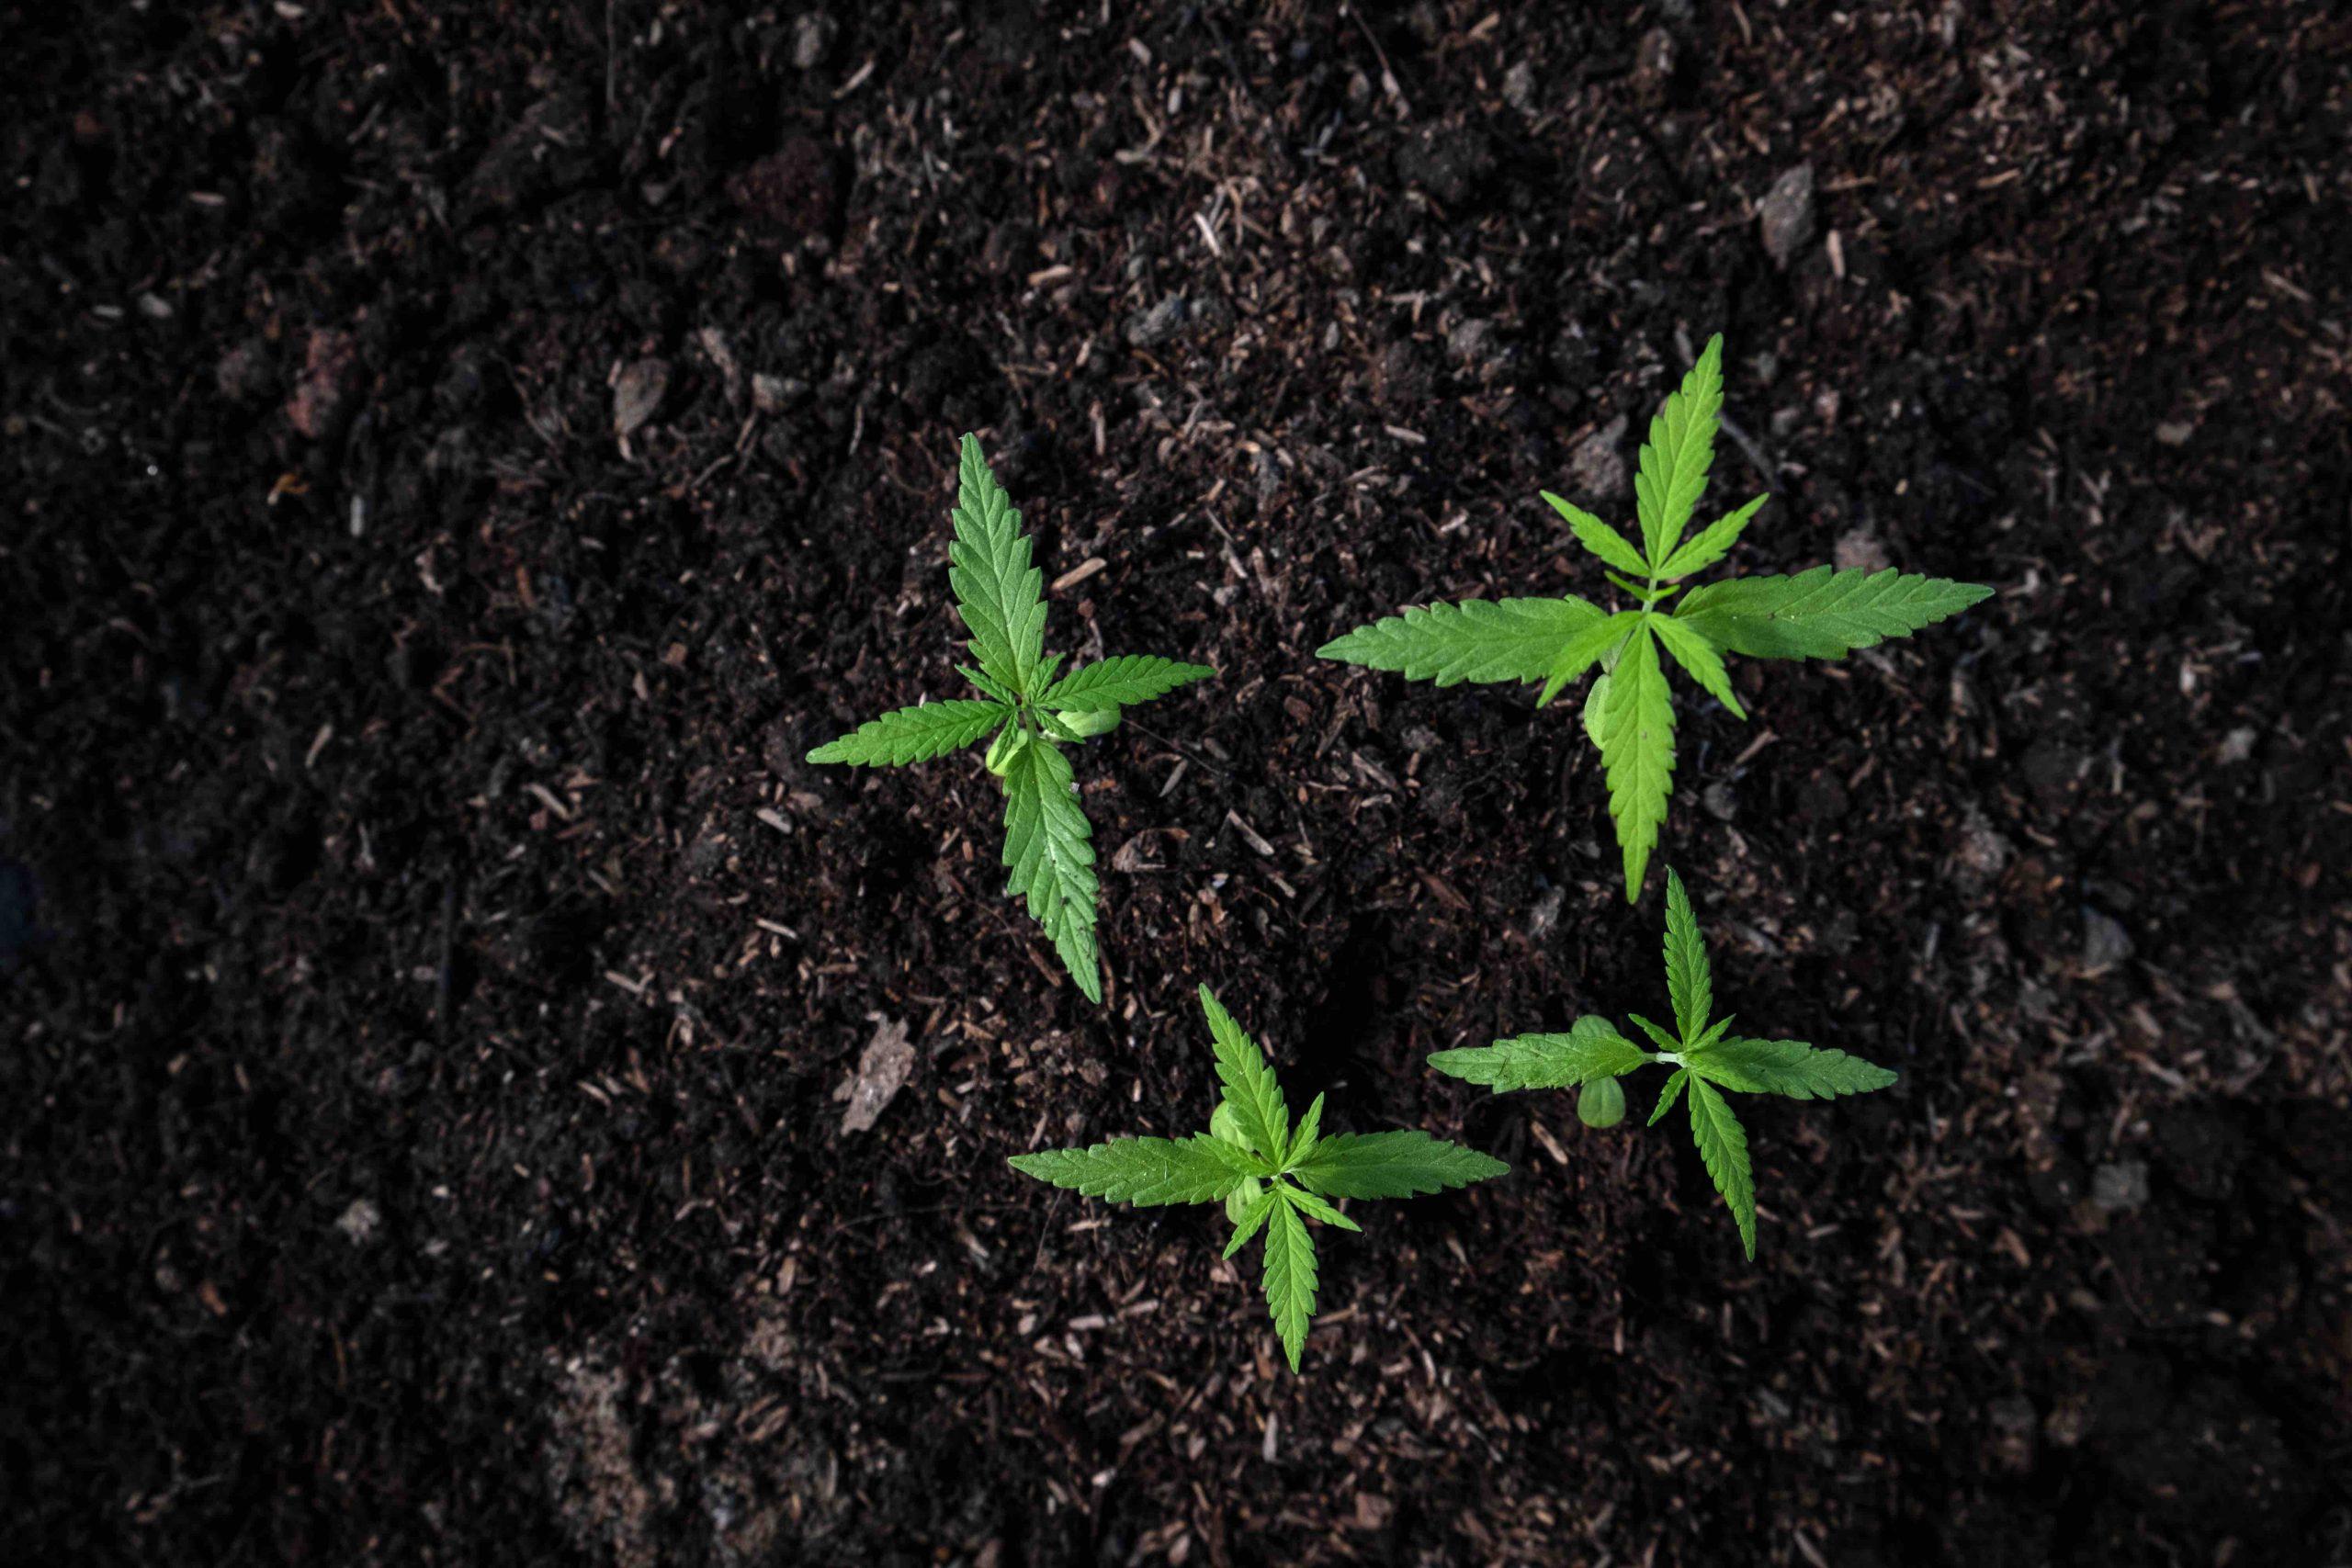 Hemp plants sprouting leaves